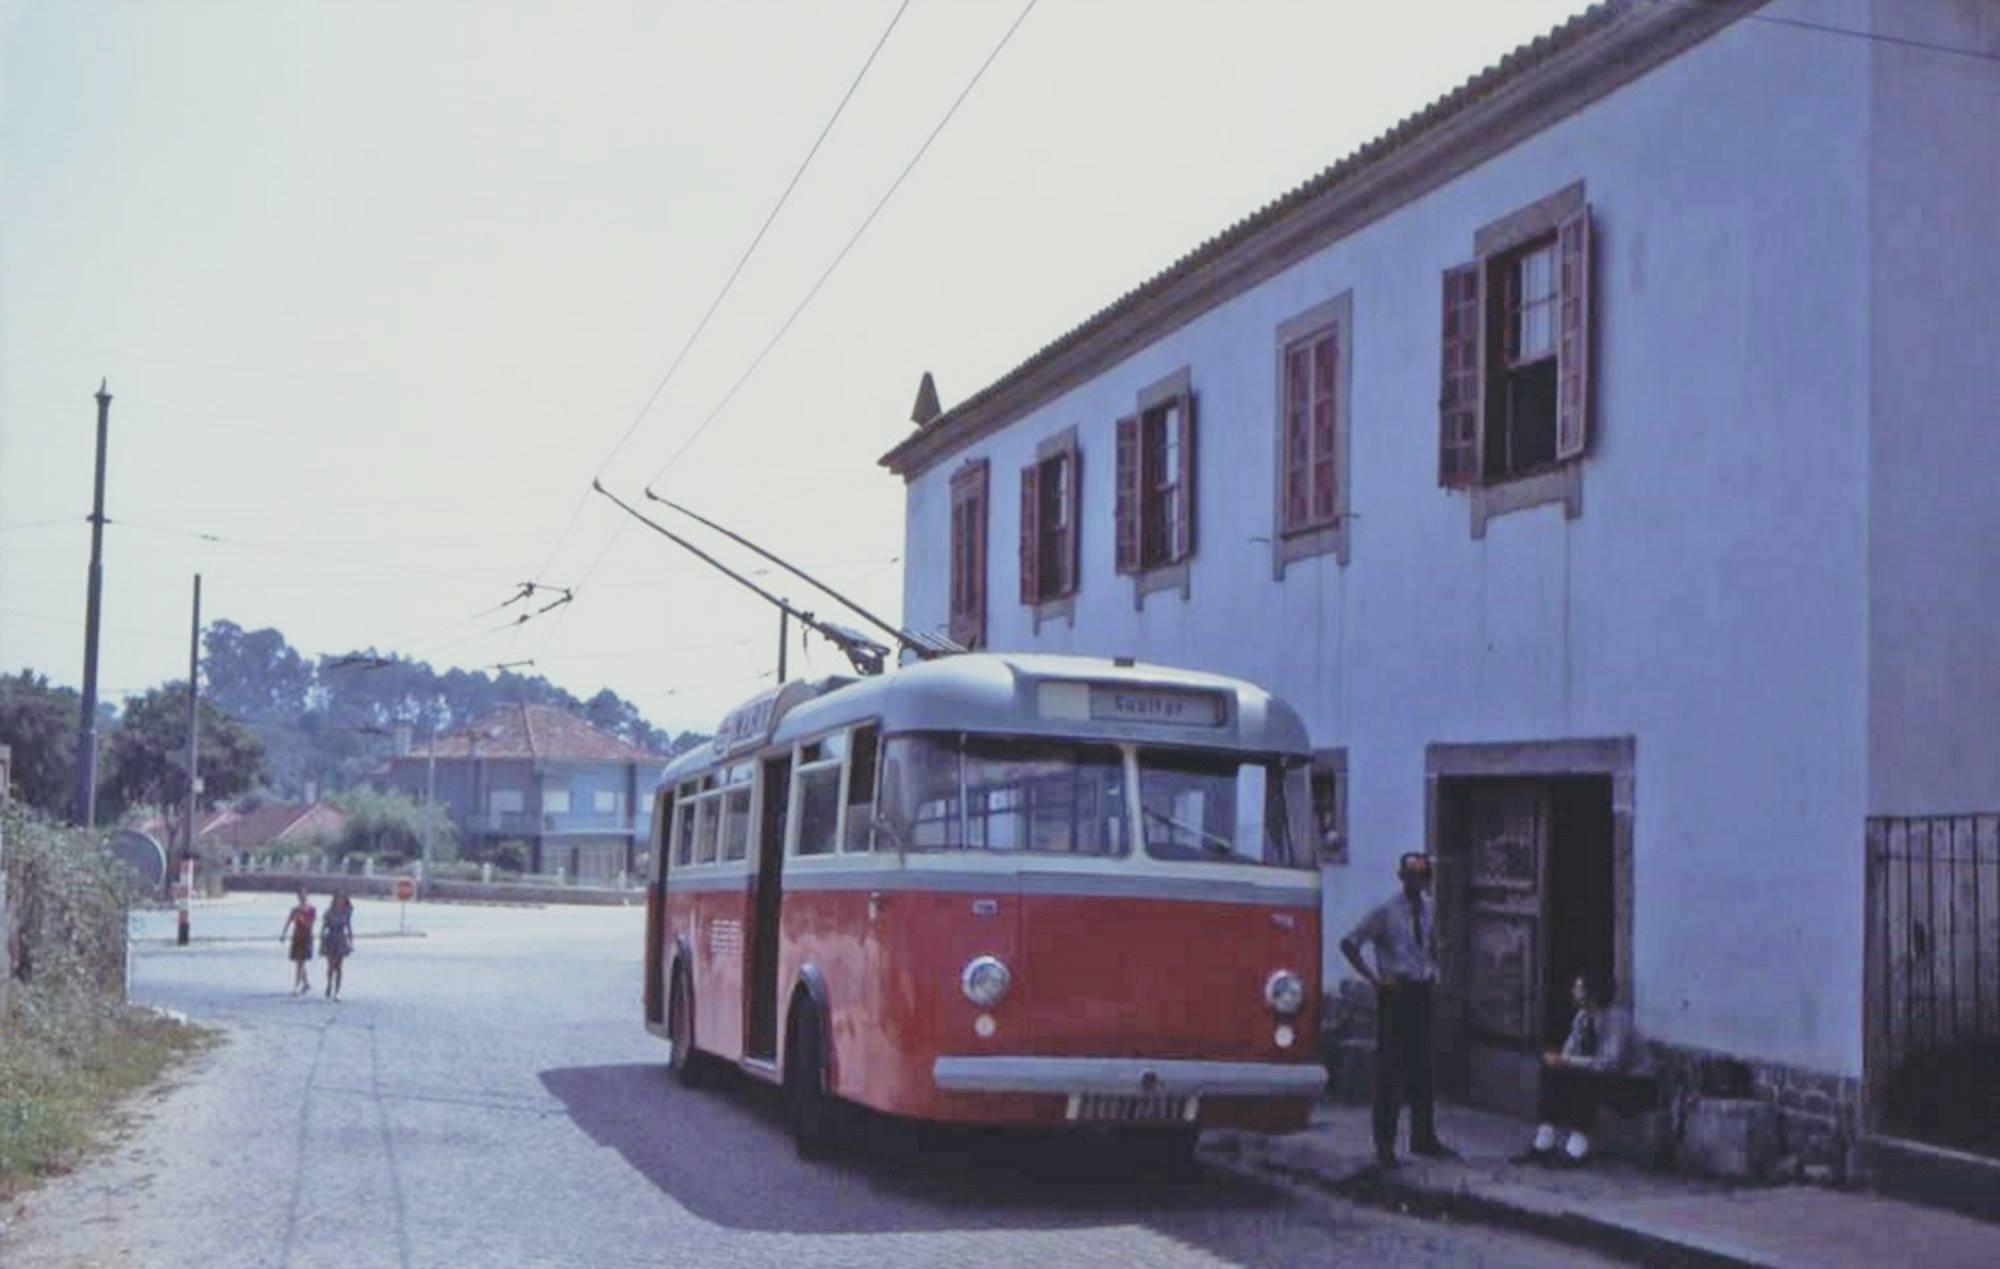 Troleicarro Braga